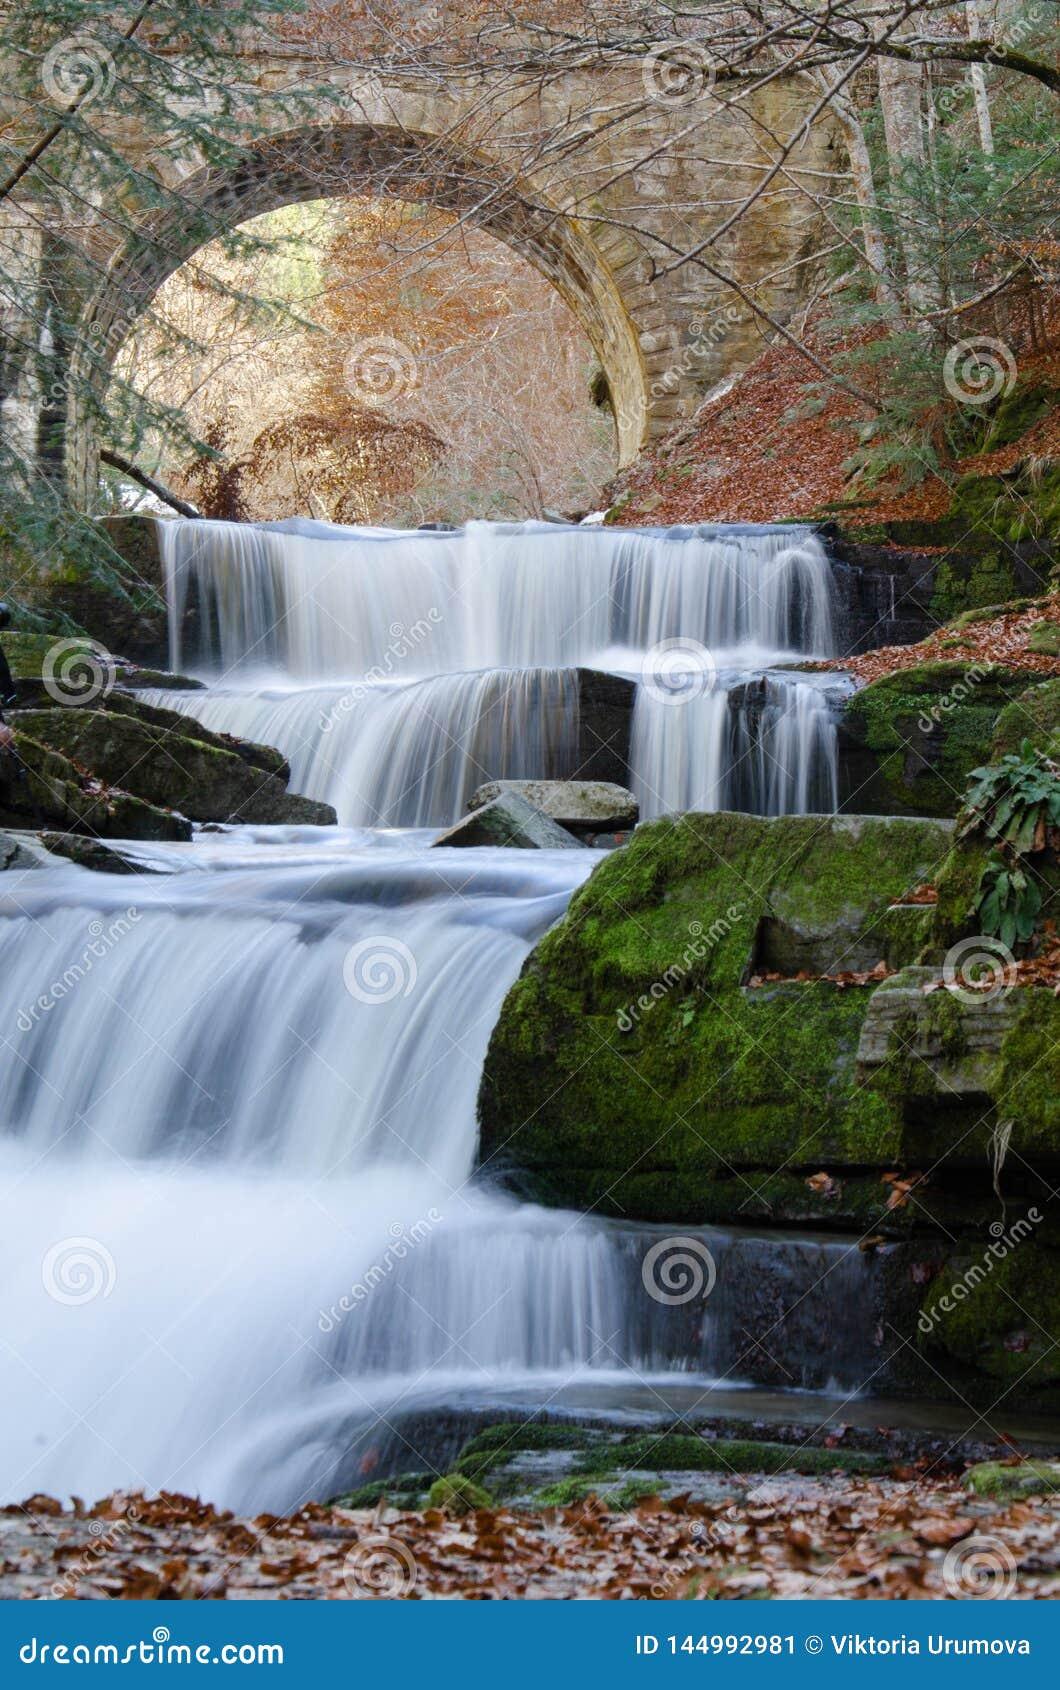 Cachoeira bonita perto da vila de Sitovo, Plovdiv, Bulgária